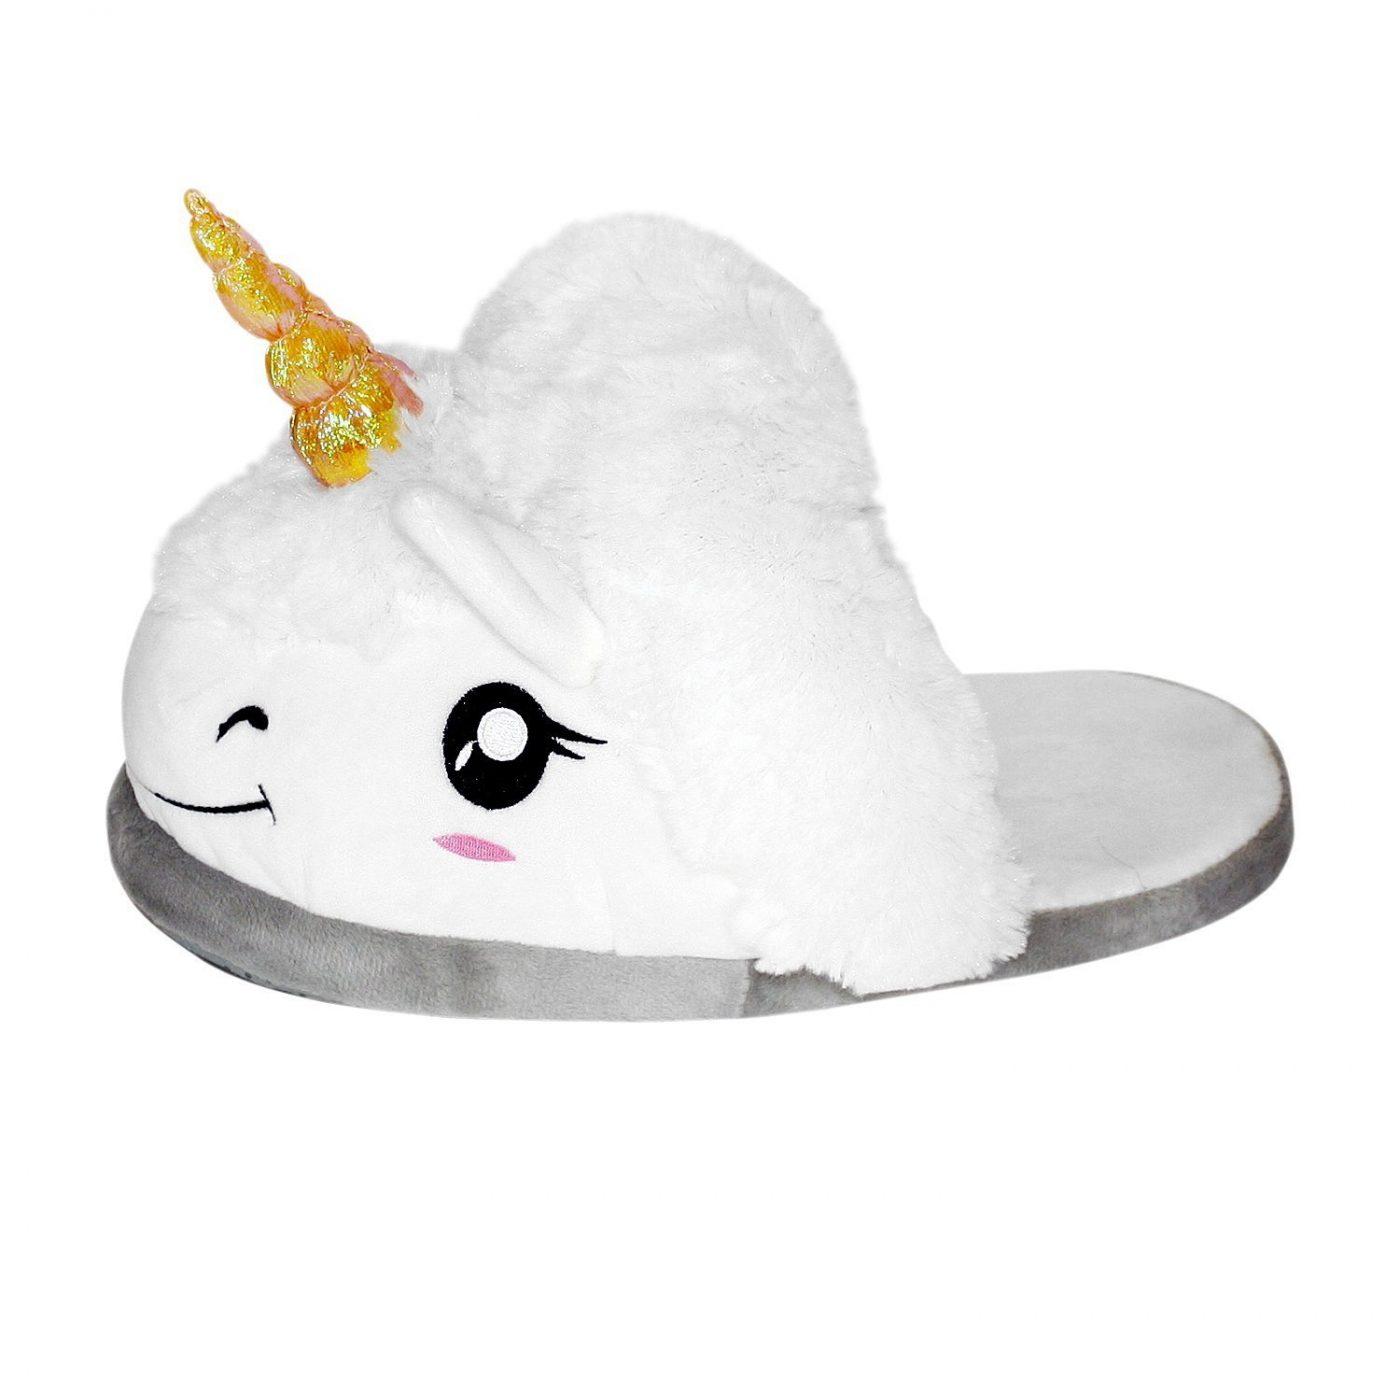 Plush Unicorn Slippers